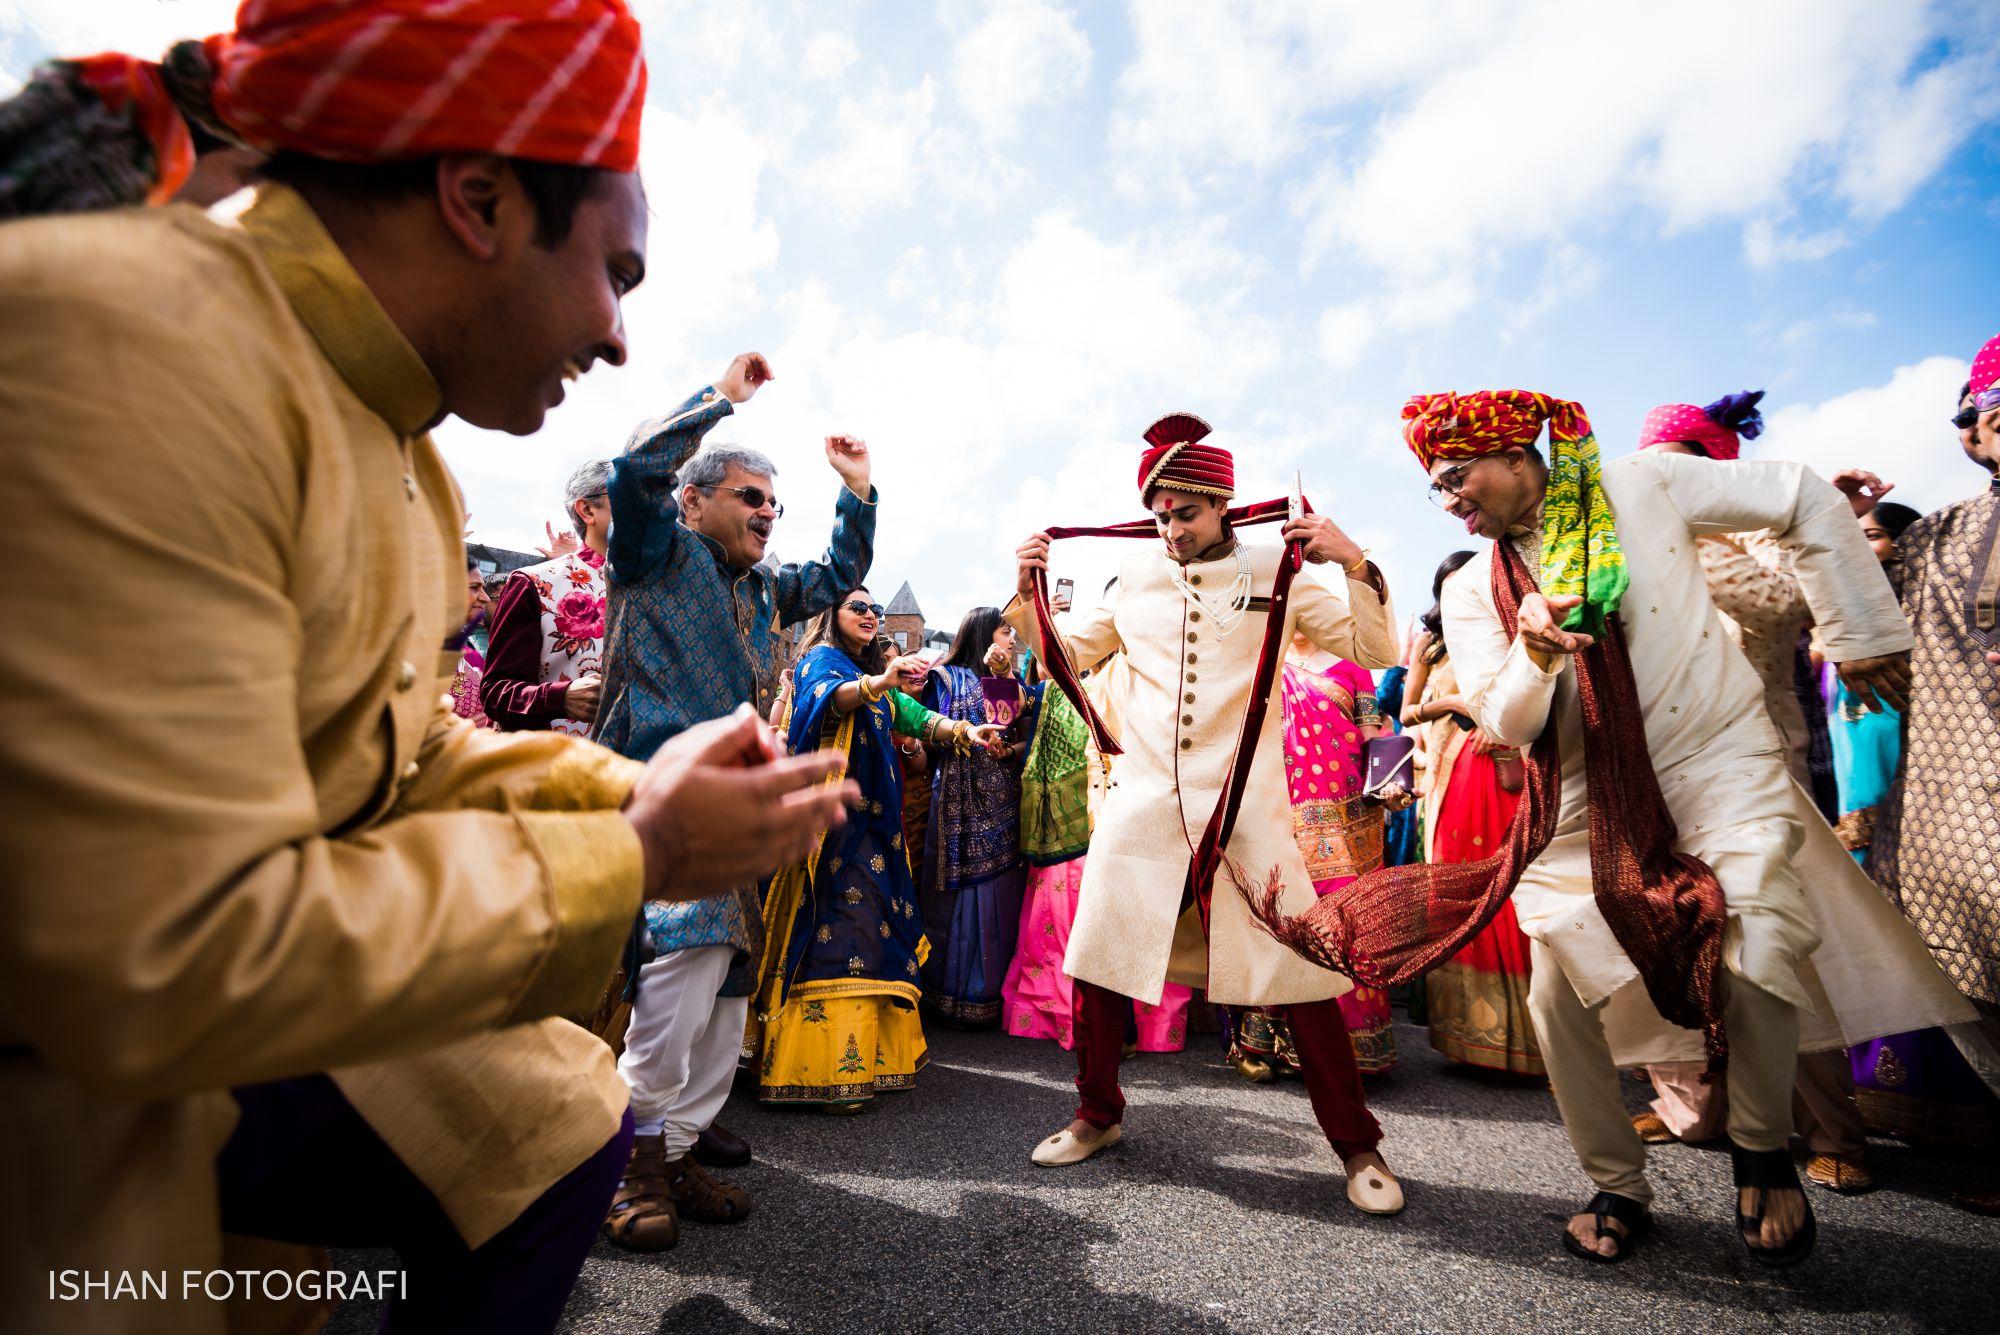 Indian-weddings-baraat-sheraton-parsippany